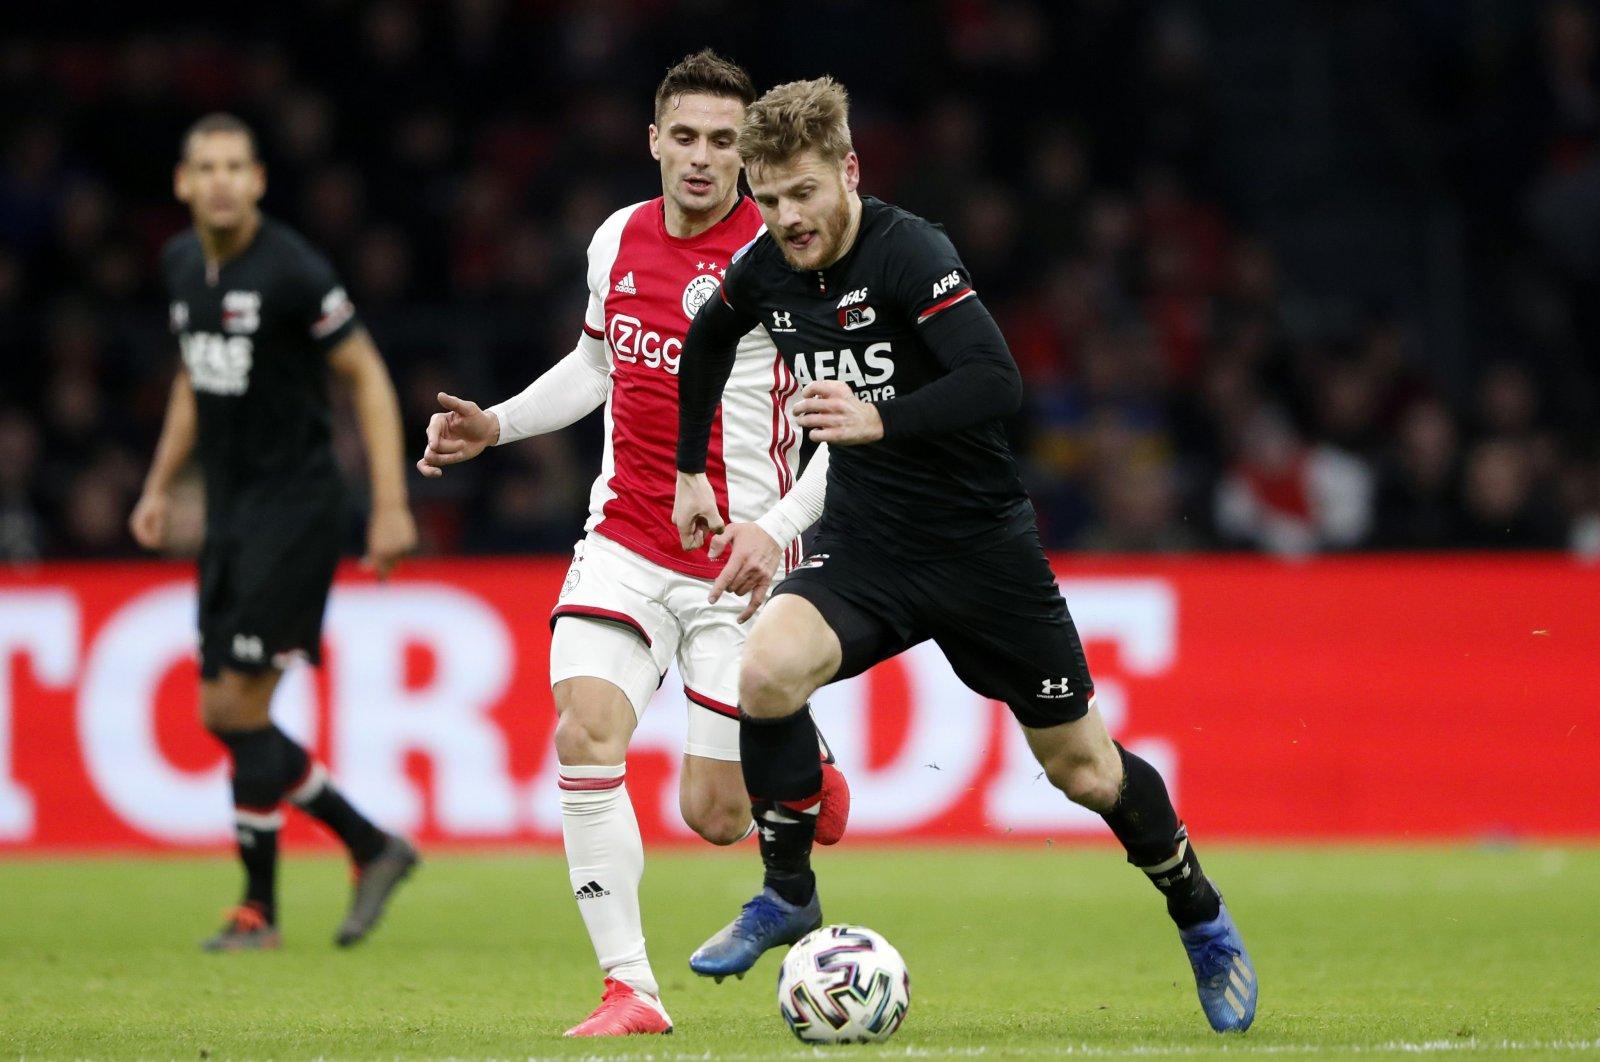 Ajax's Dusan Tadic fights for the ball against AZ Alkmaar's Frederik Midtsjo during an Eredivisie match, Alkmaar, March 1, 2020. (AFP Photo)